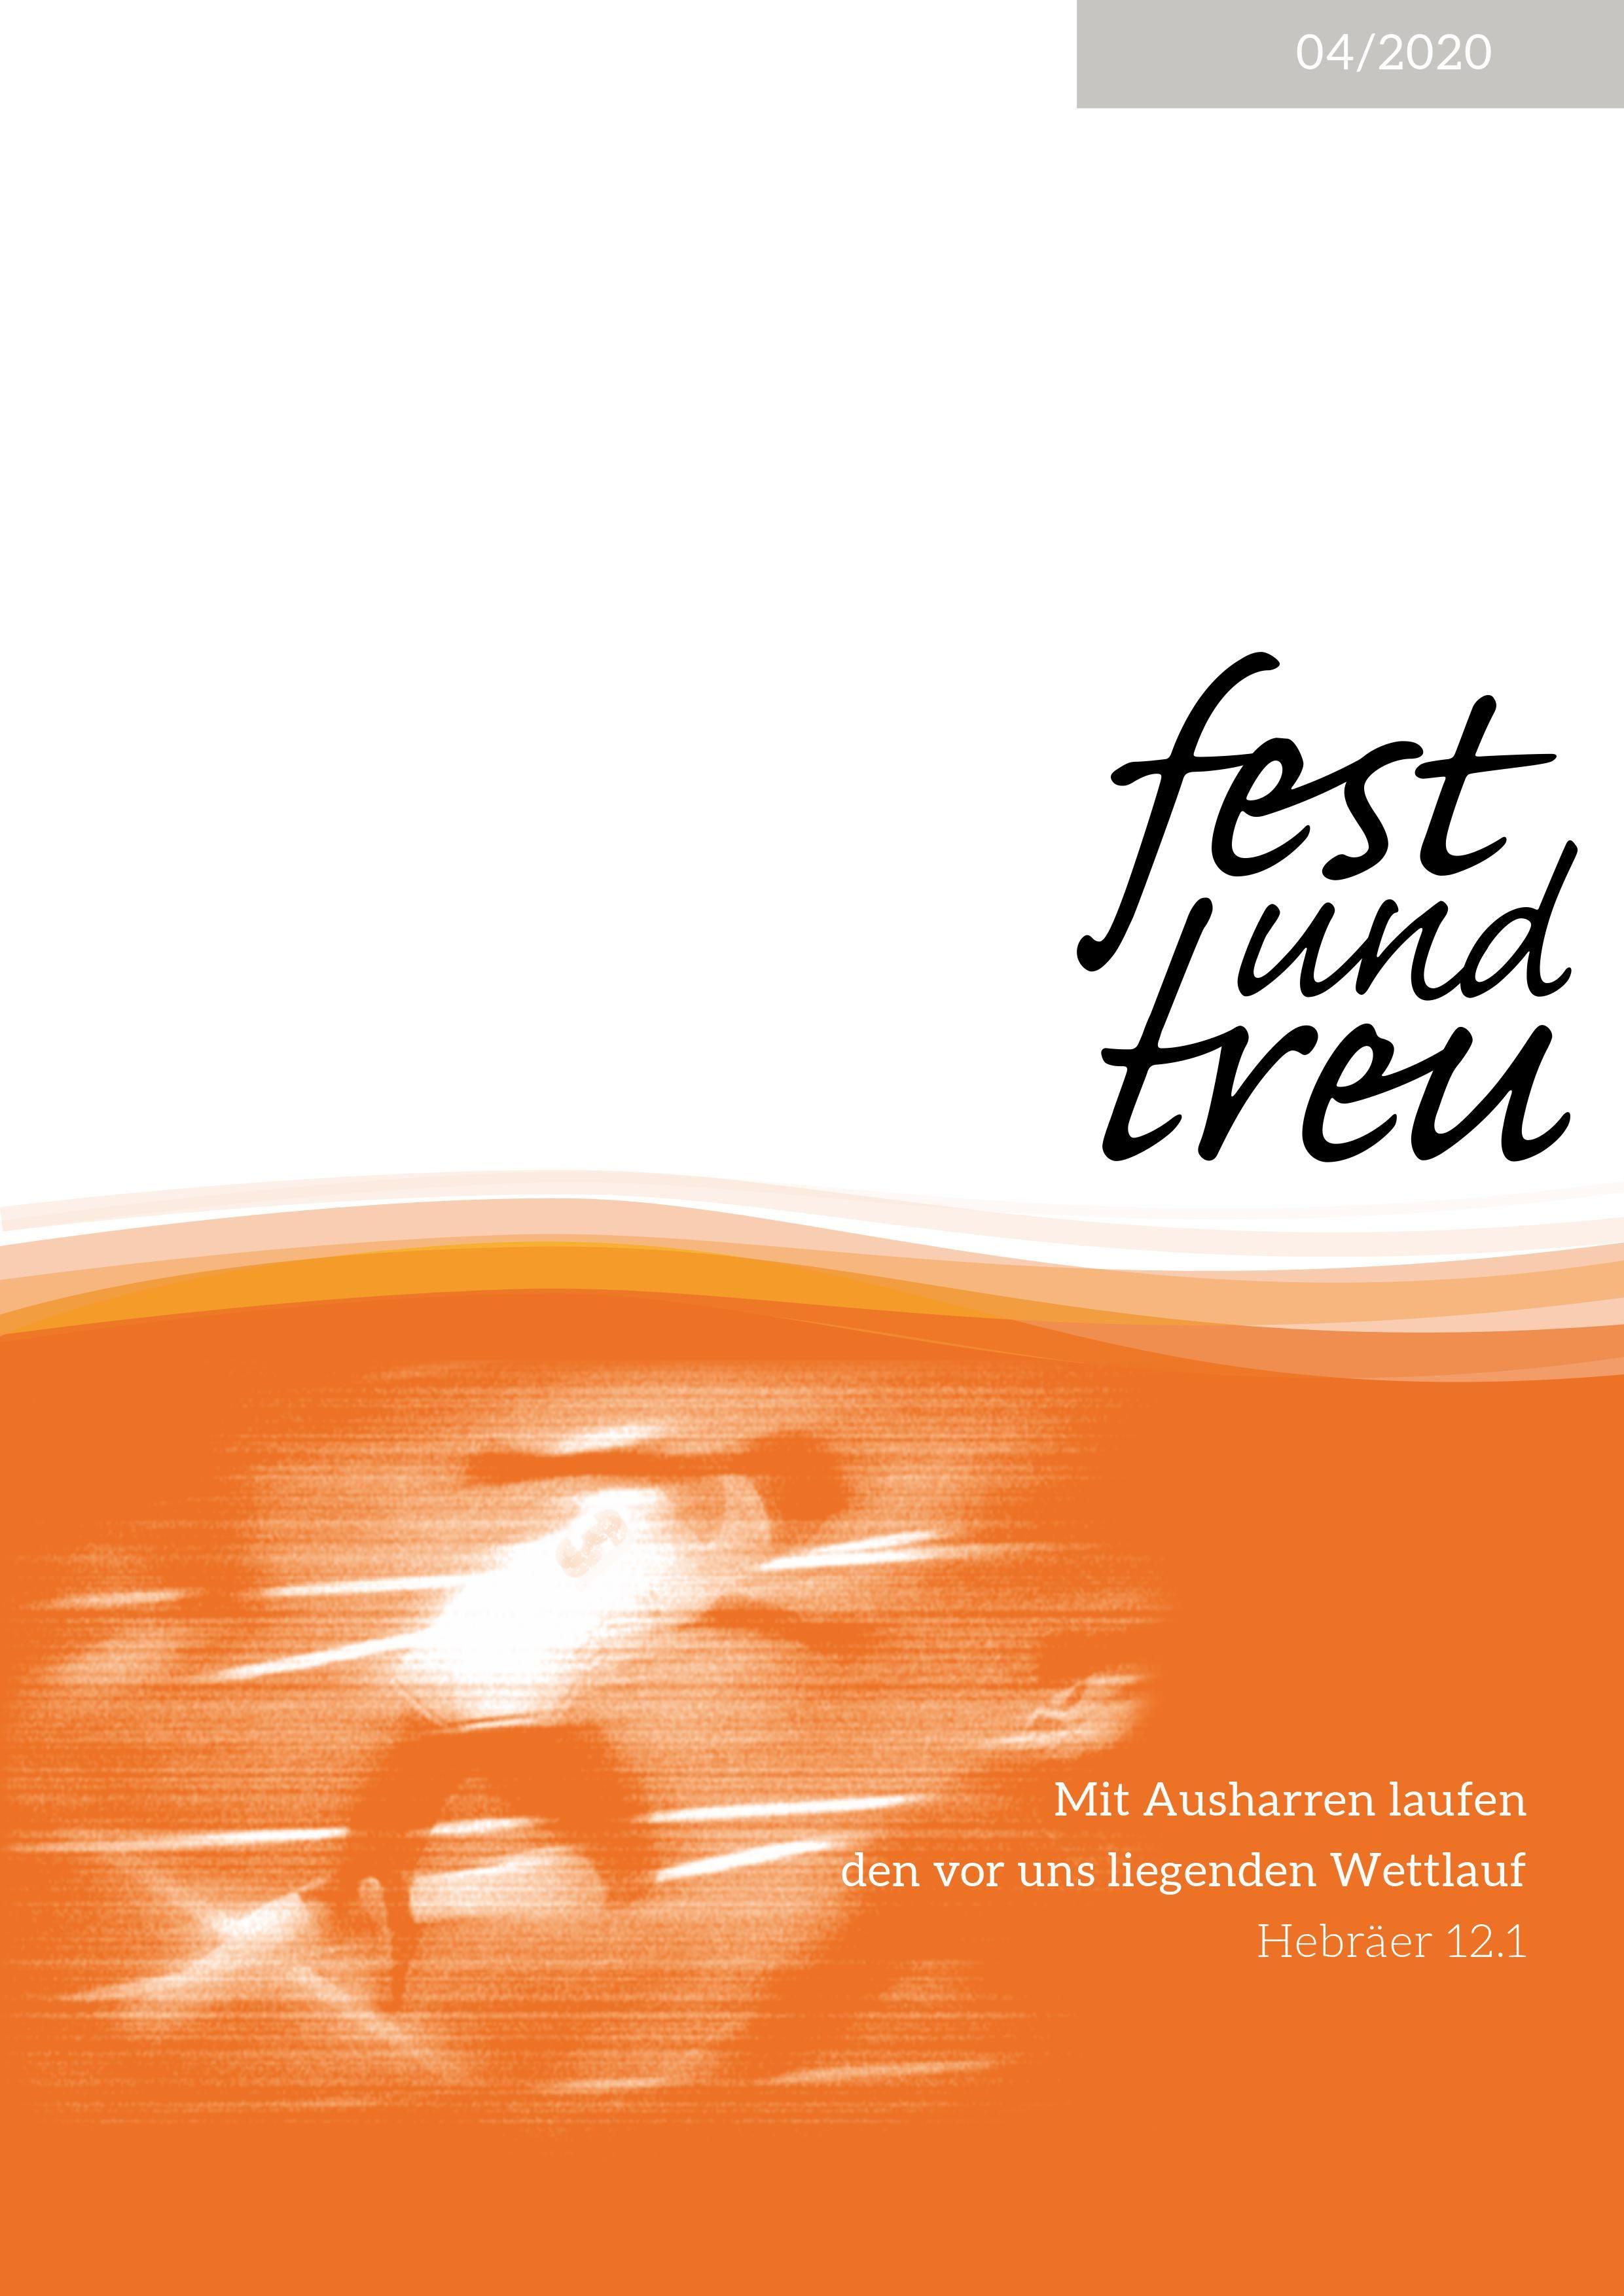 fest & treu - 4/2020